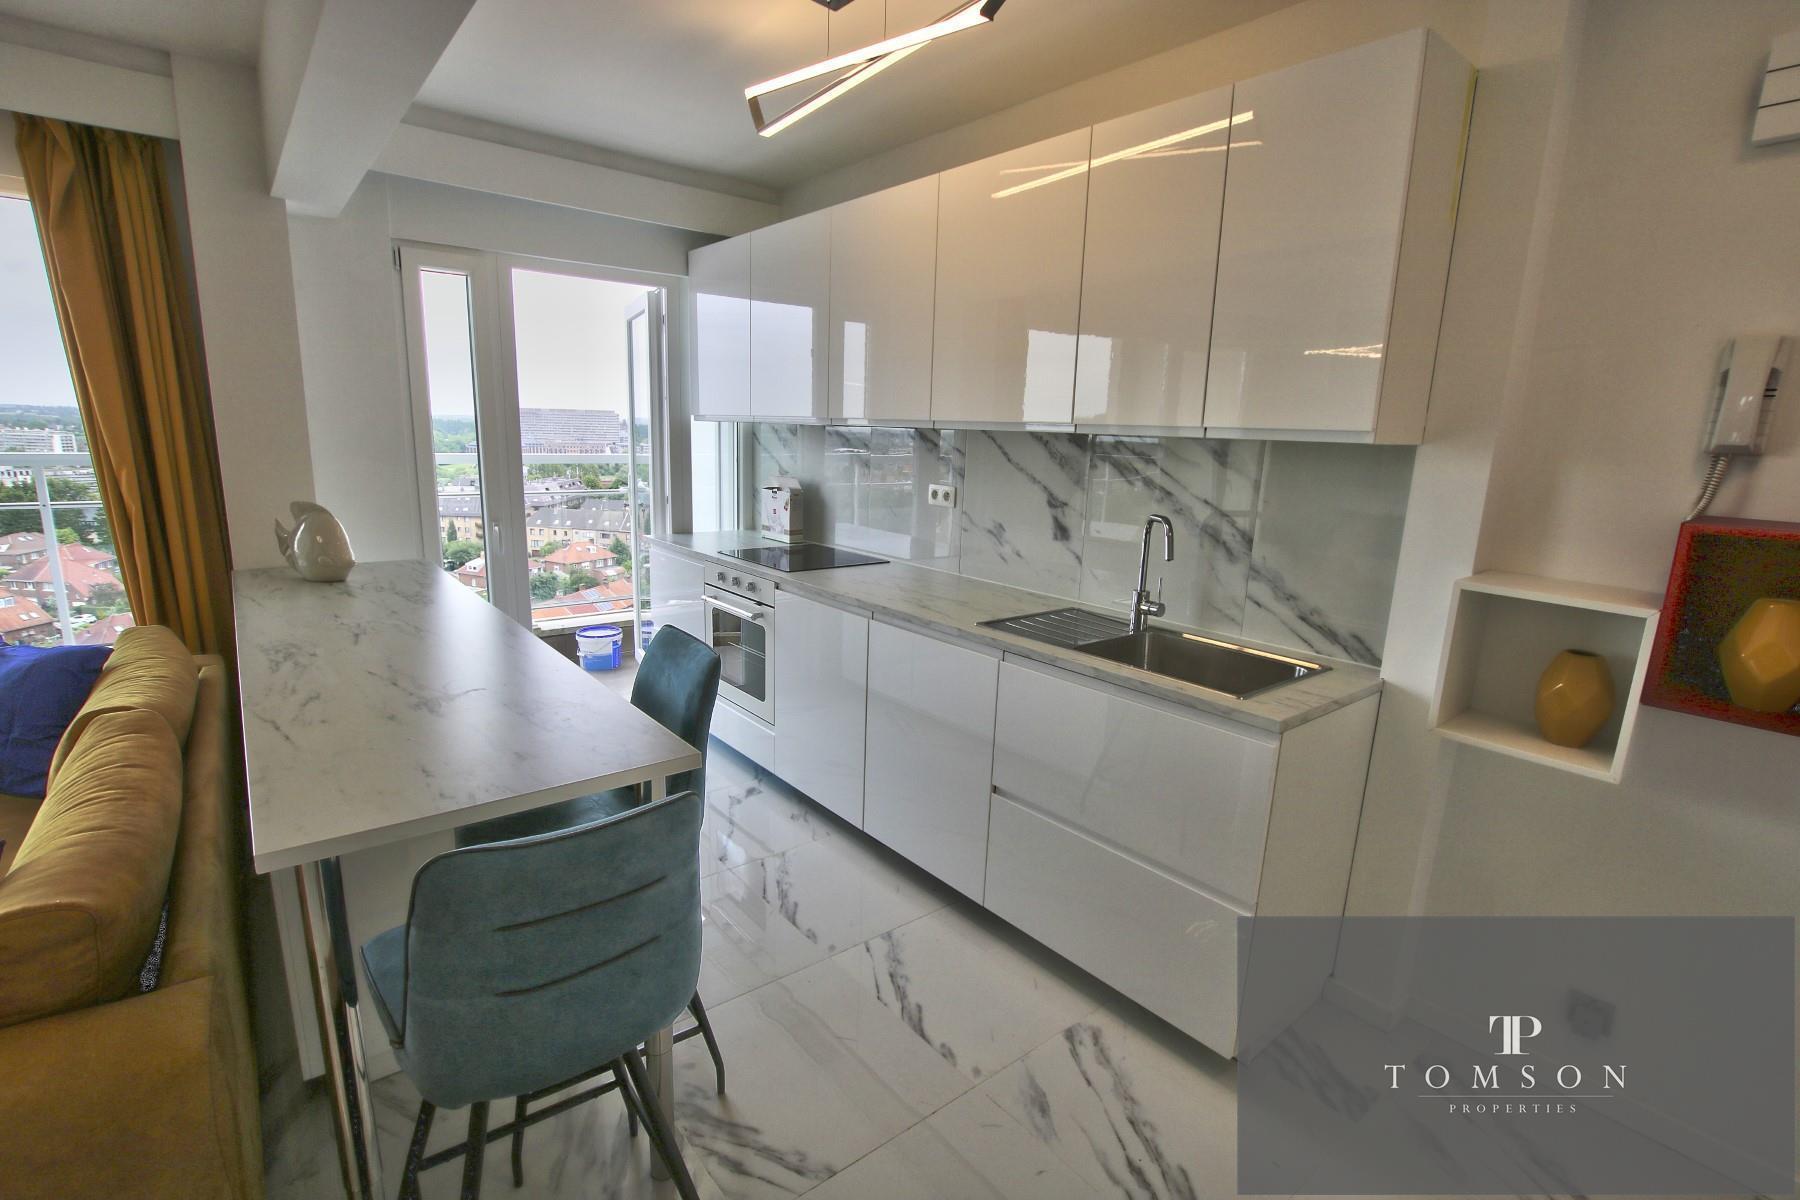 Appartement - Woluwe-Saint-Lambert - #4530512-2